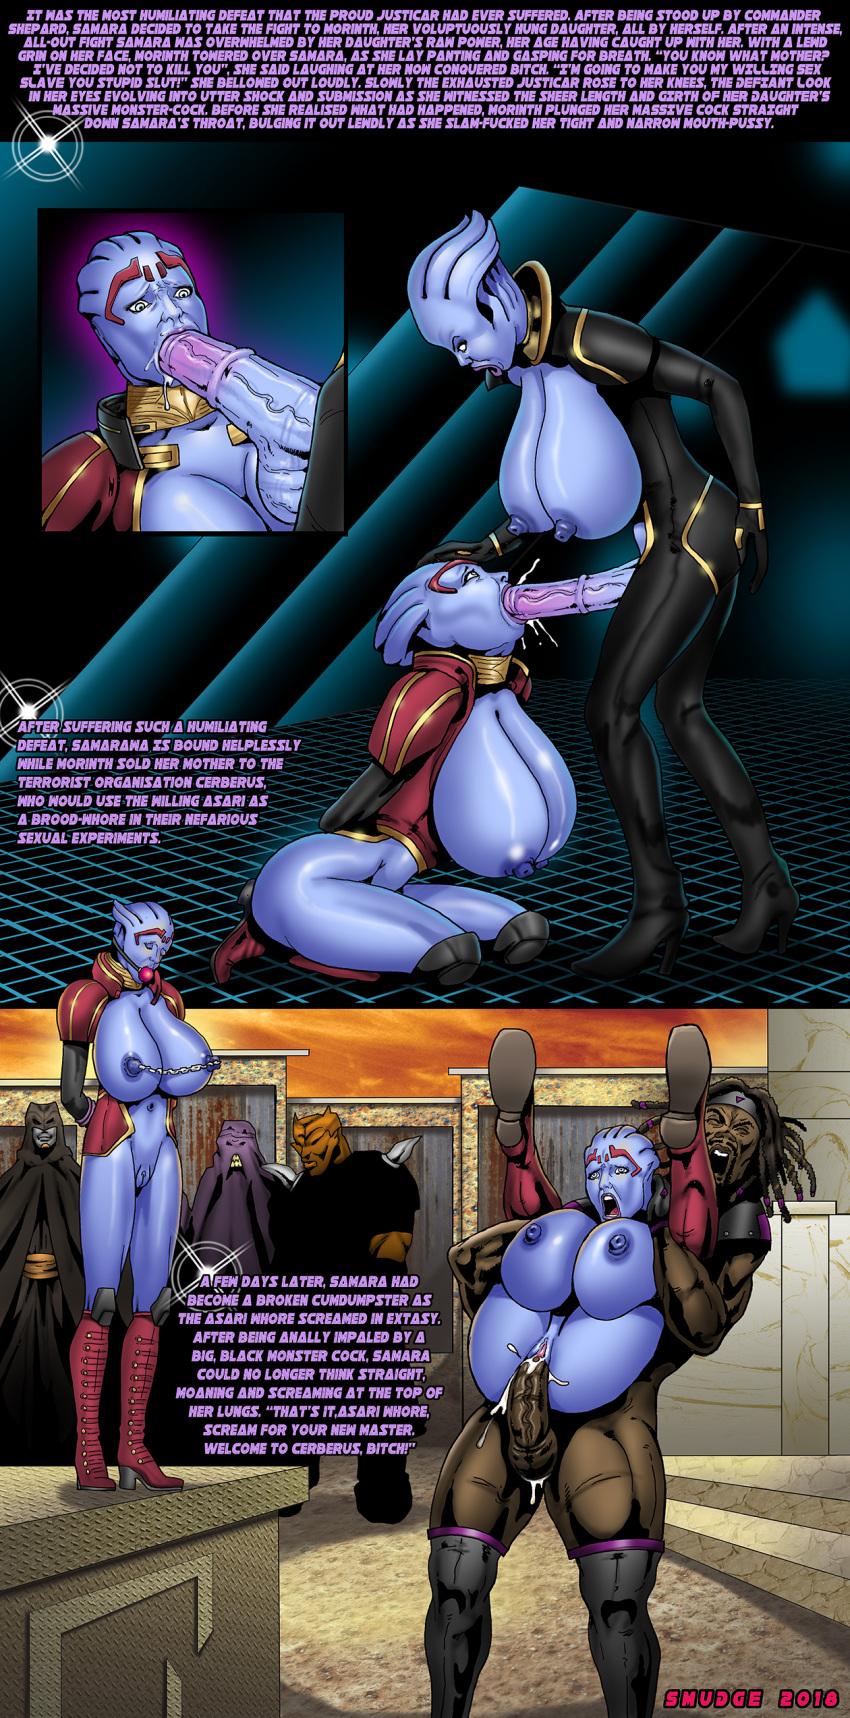 jack mass in 3 effect Avatar the last airbender lesbian